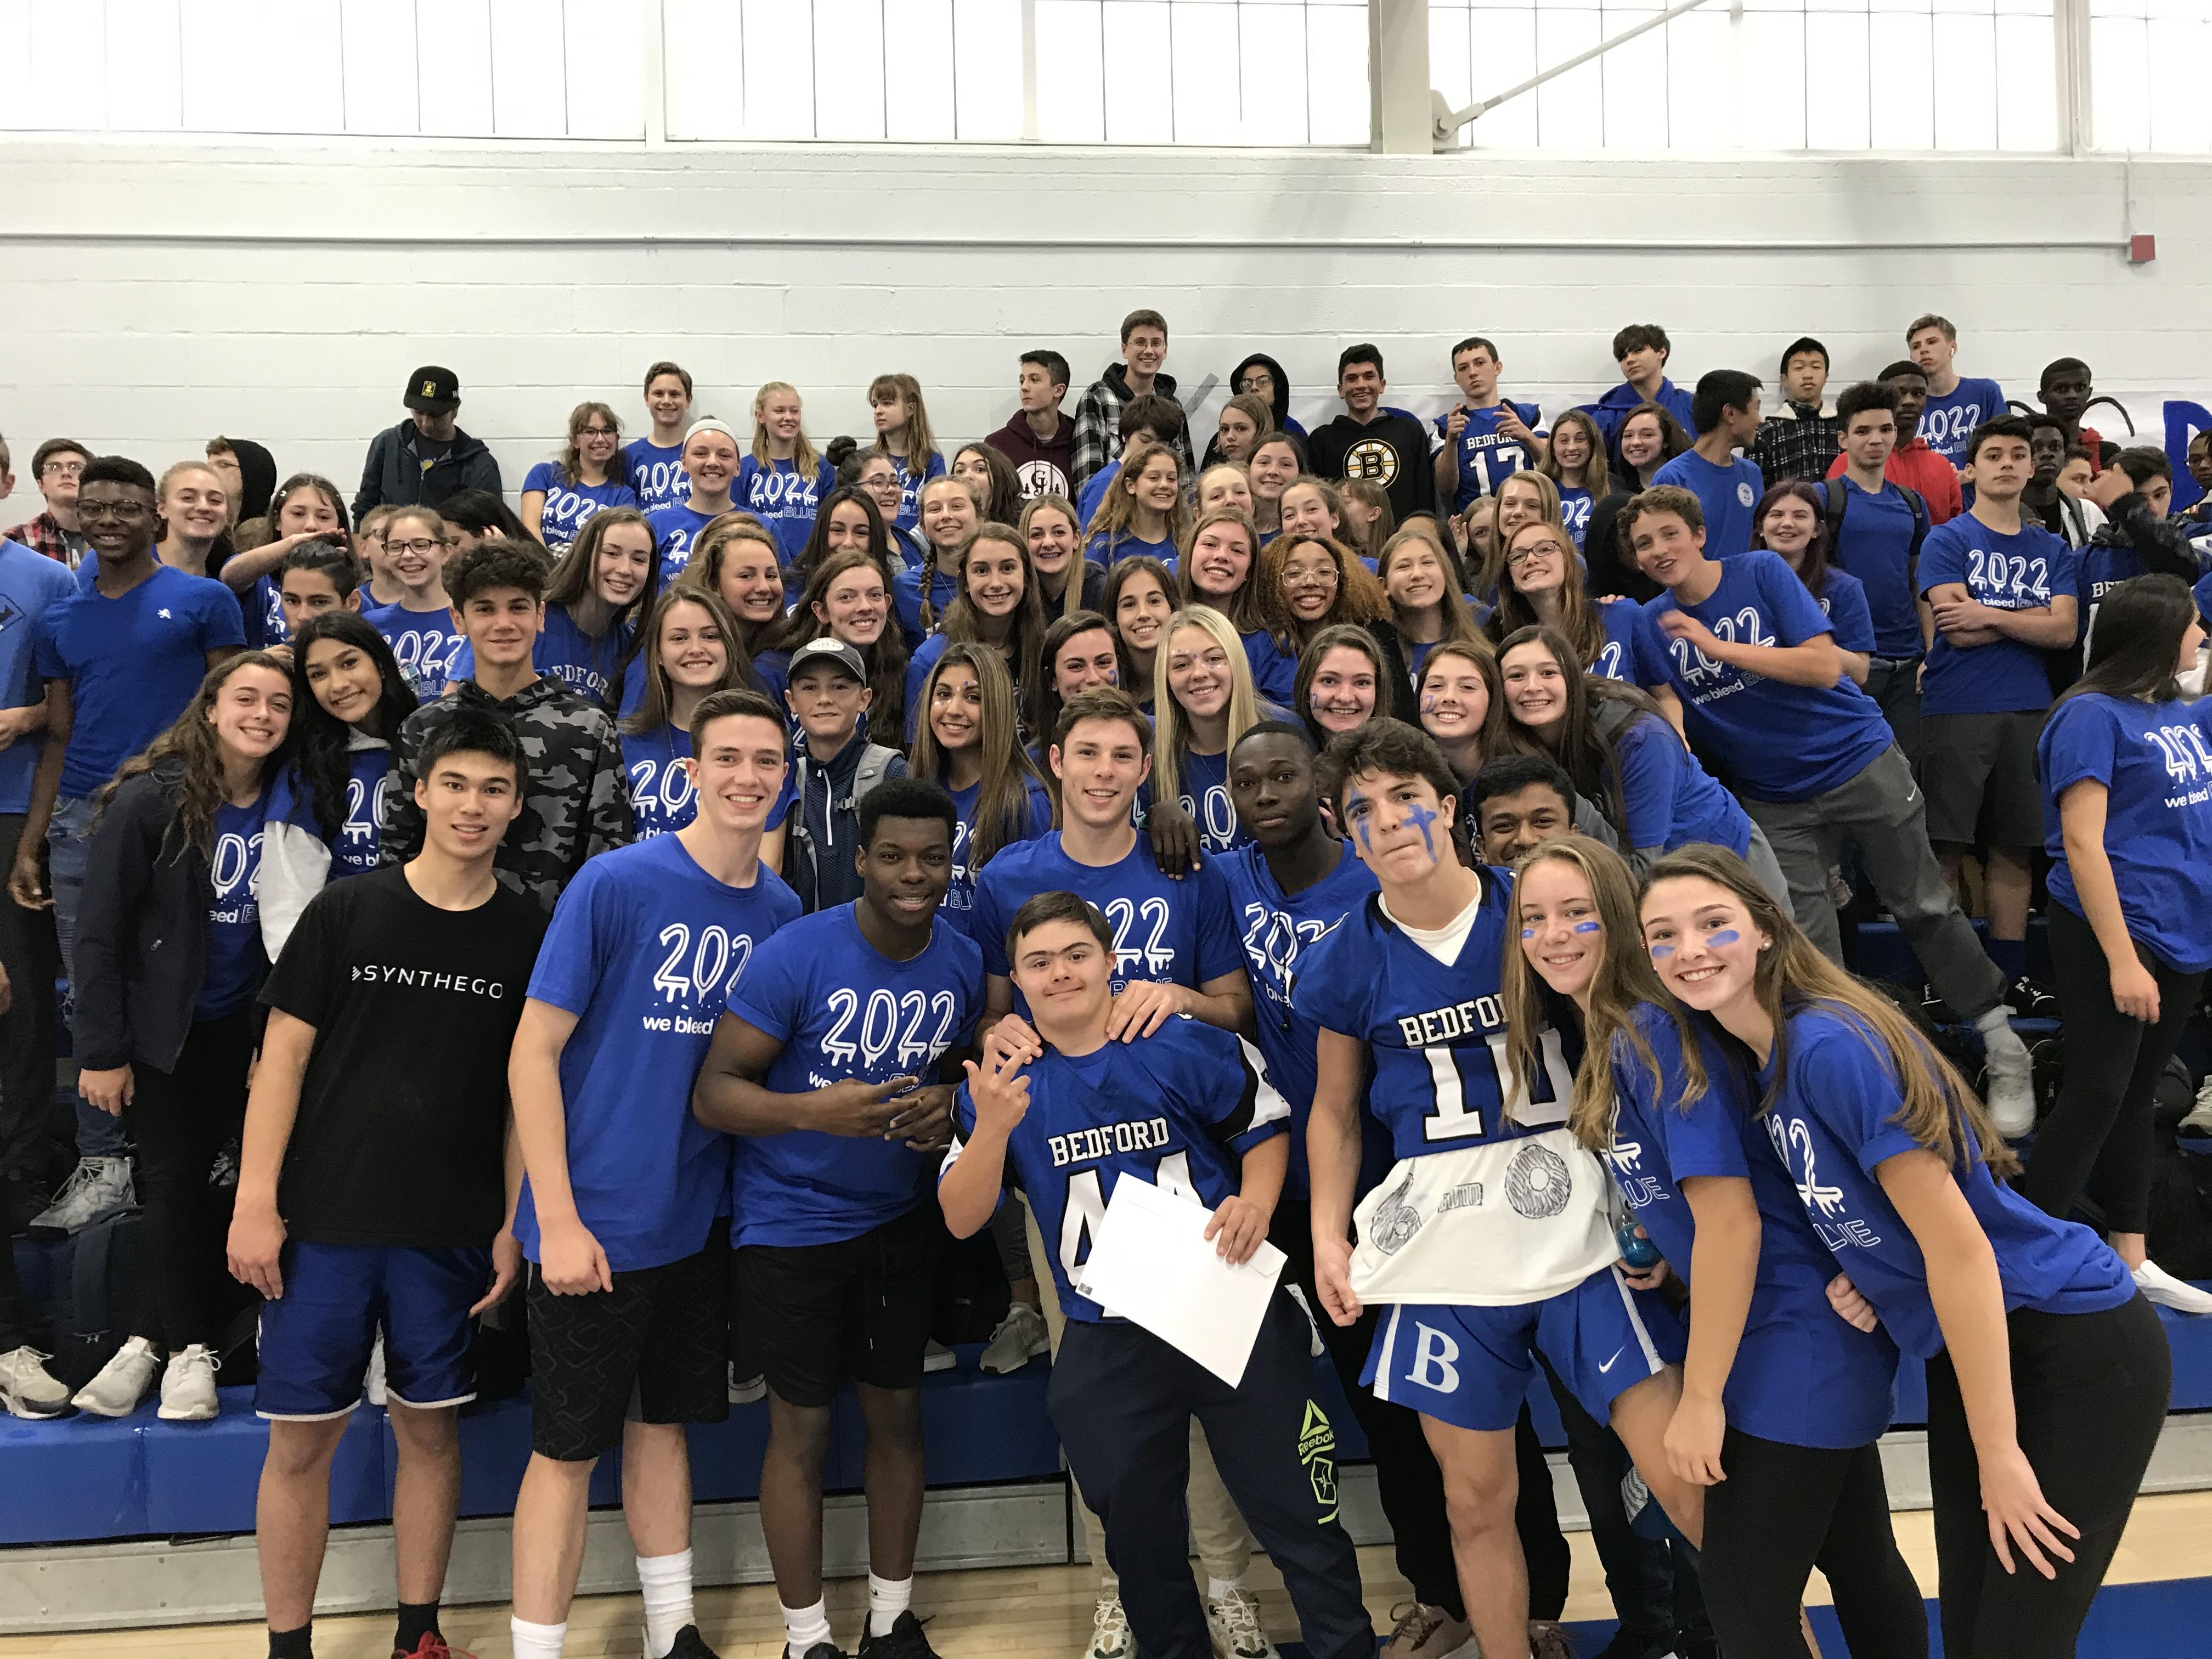 BHS rally